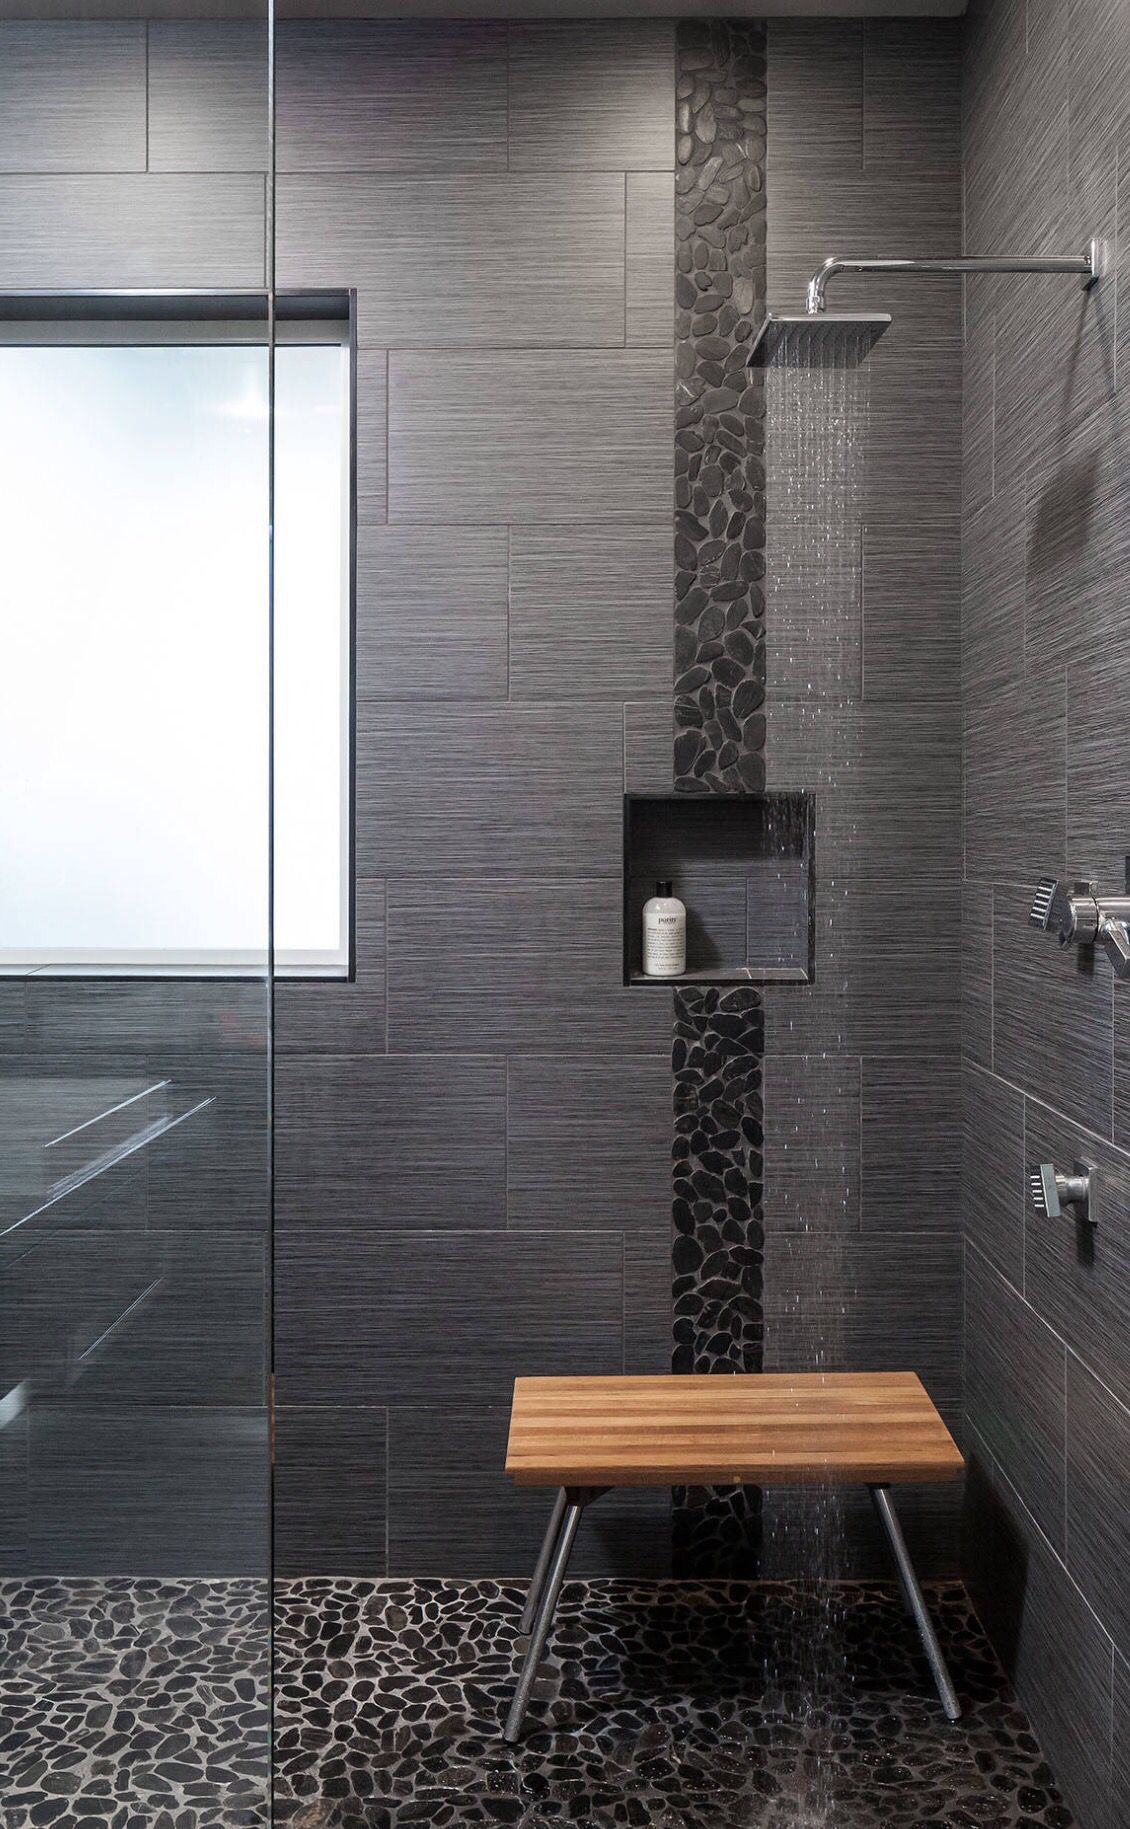 Tile placement. | Splish Splash! | Pinterest | Splish splash